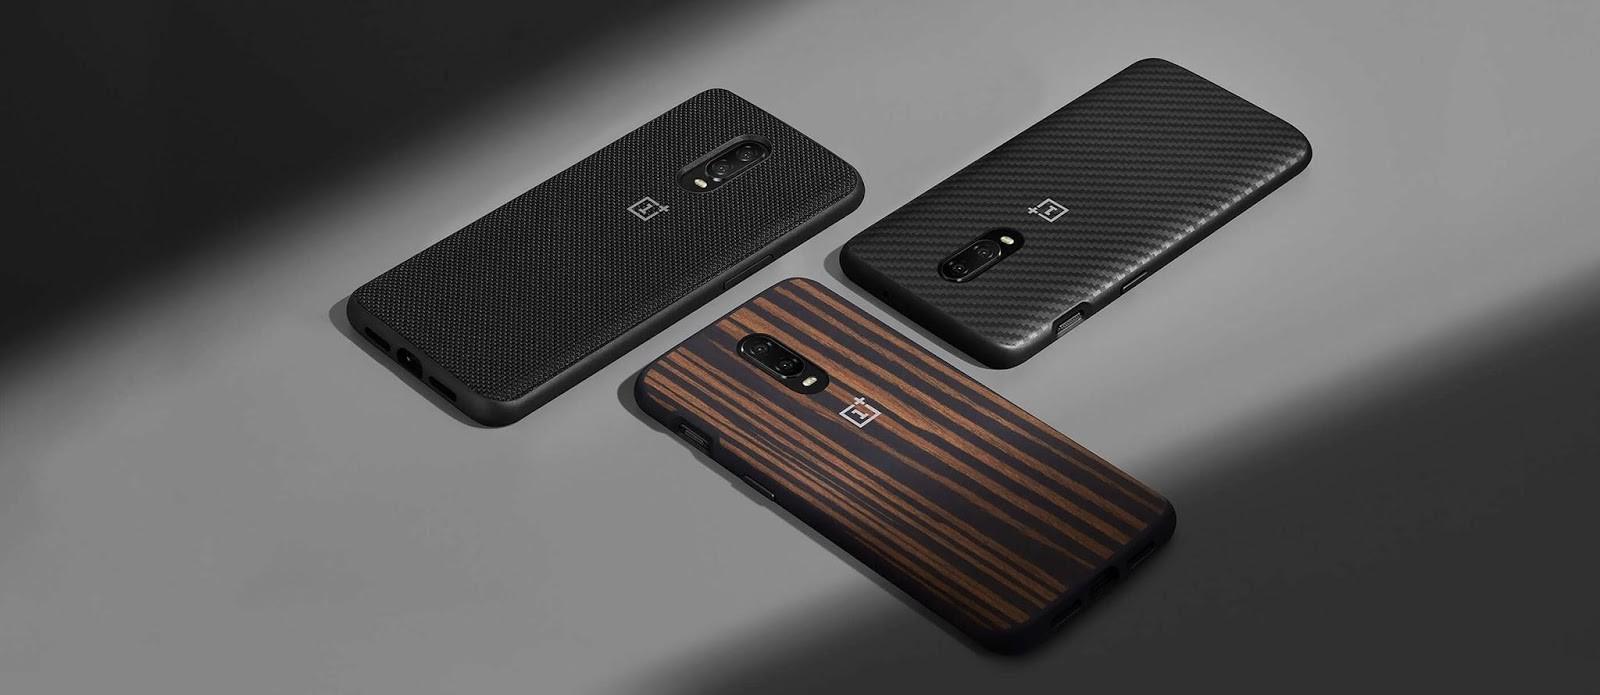 OnePlus 6T Official Bumper Case